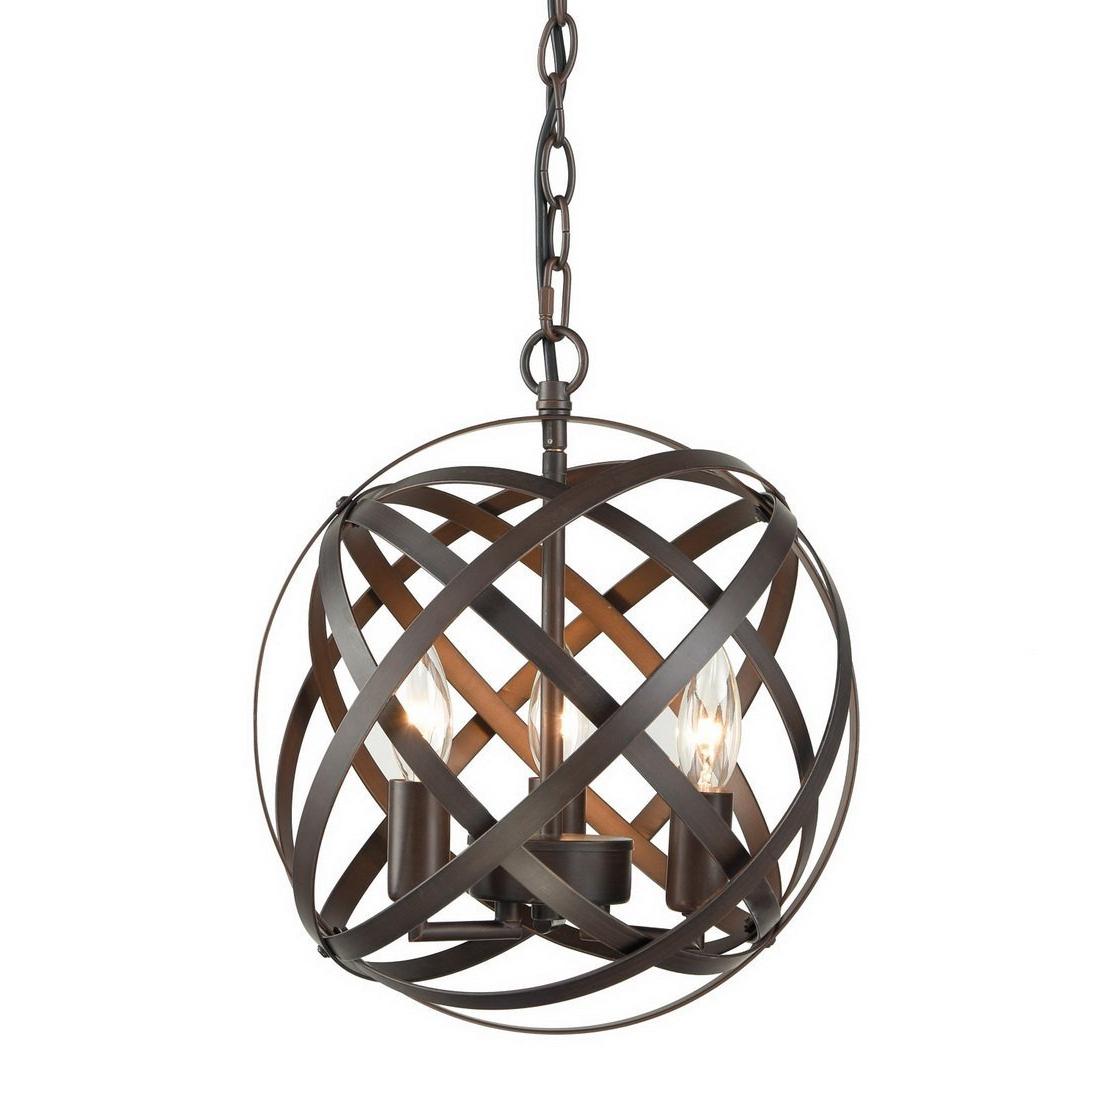 Most Current Mcinerney Cage 3 Light Globe Chandelier Inside Shipststour 3 Light Globe Chandeliers (View 13 of 25)